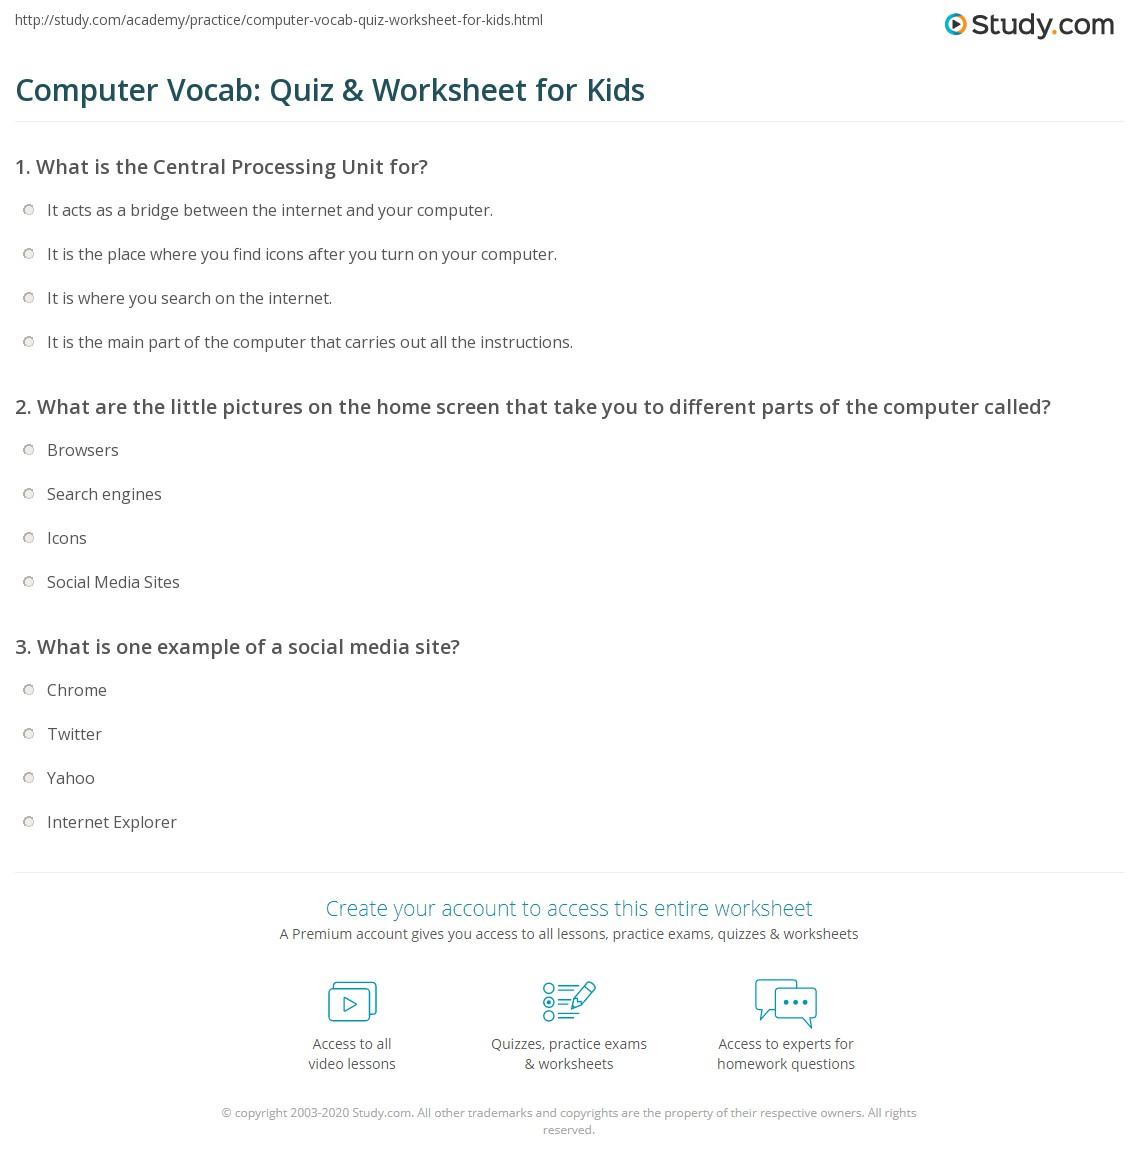 Computer Vocab: Quiz & Worksheet for Kids | Study.com